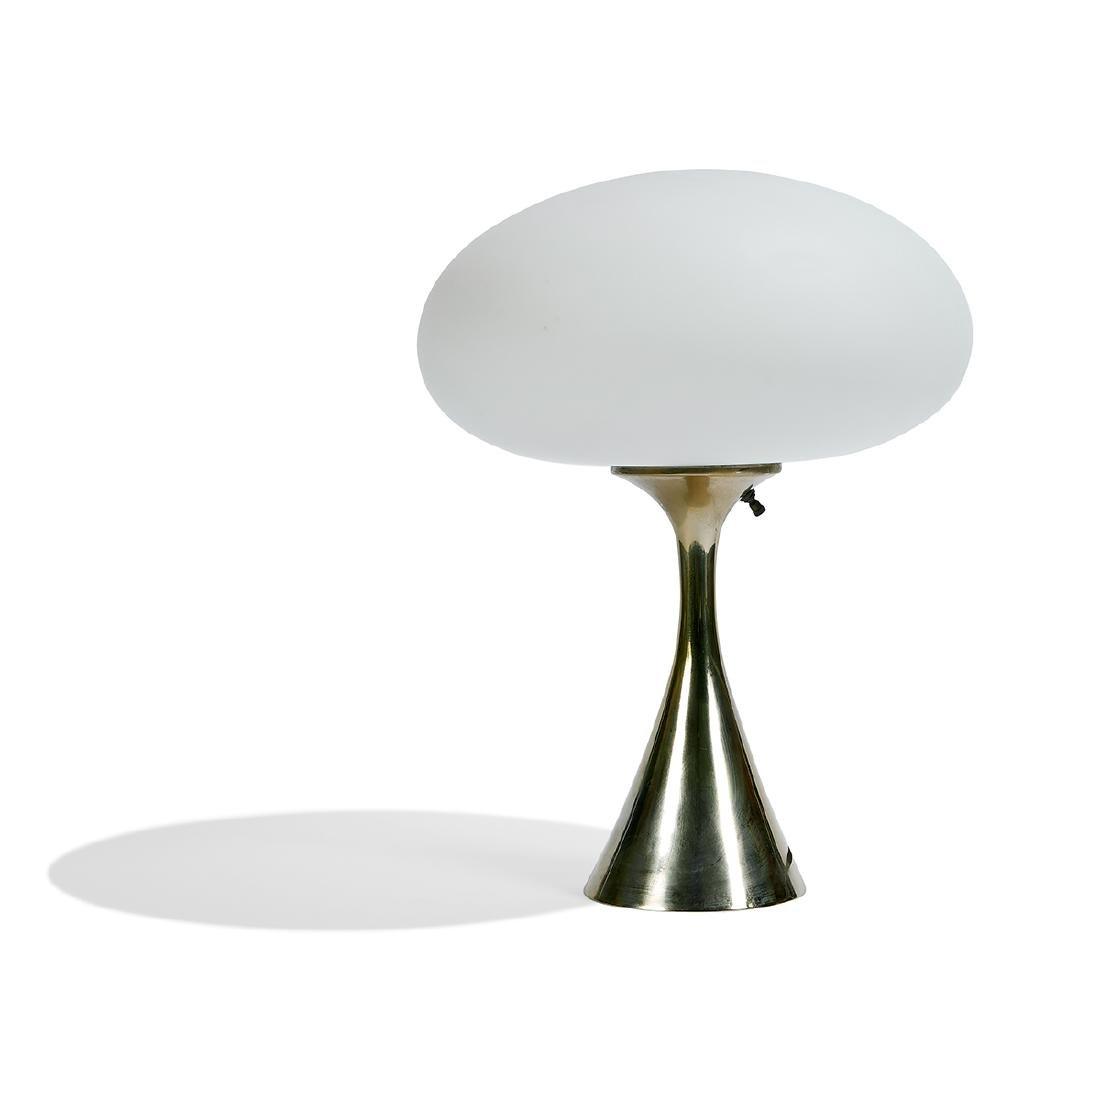 Laurel Lamp Manufacturing Co. table lamp